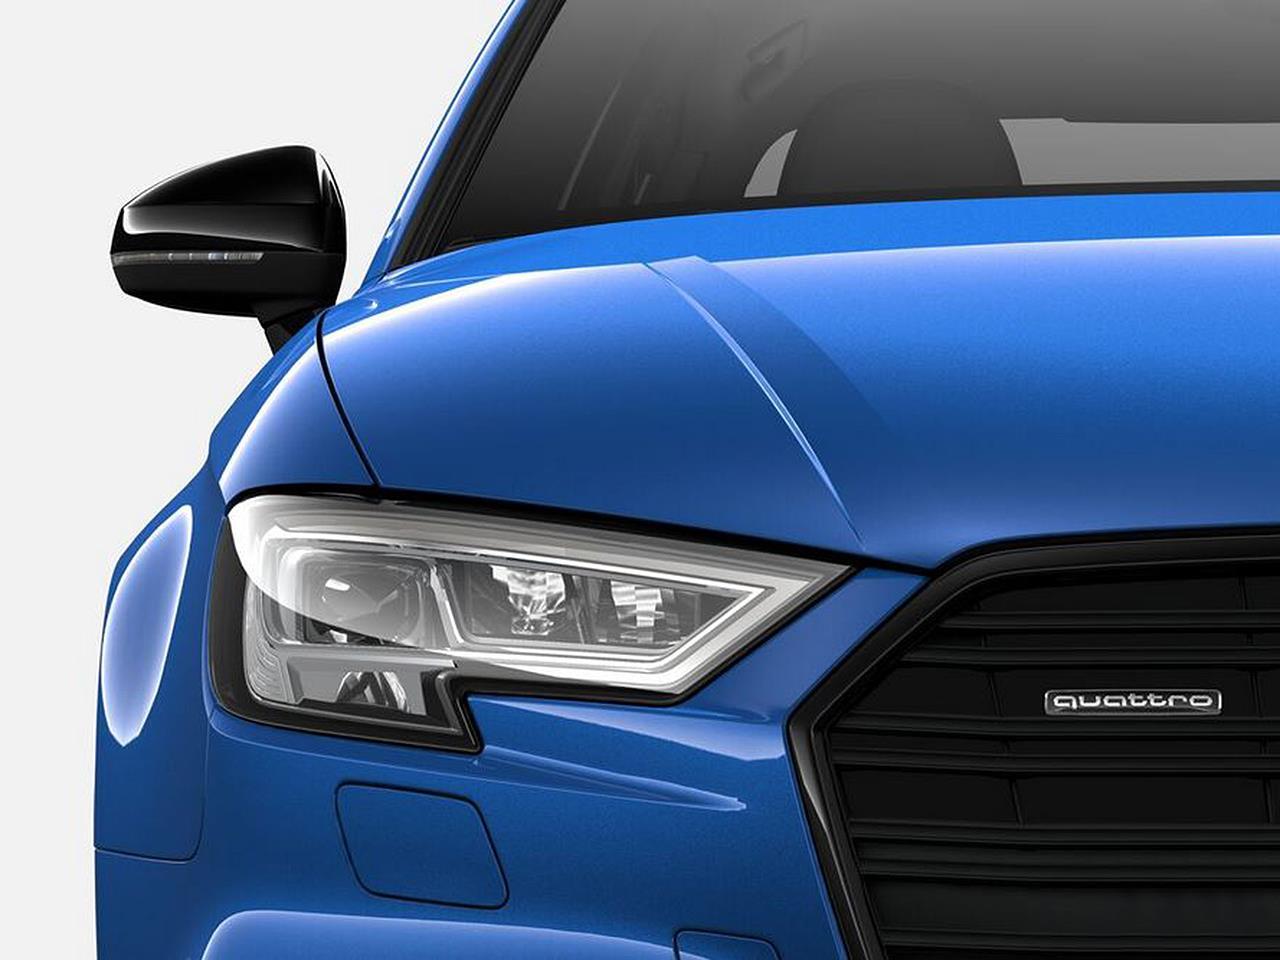 2021 Audi S3 Black Rear Lip Spoiler and Mirror Cap Kit ...